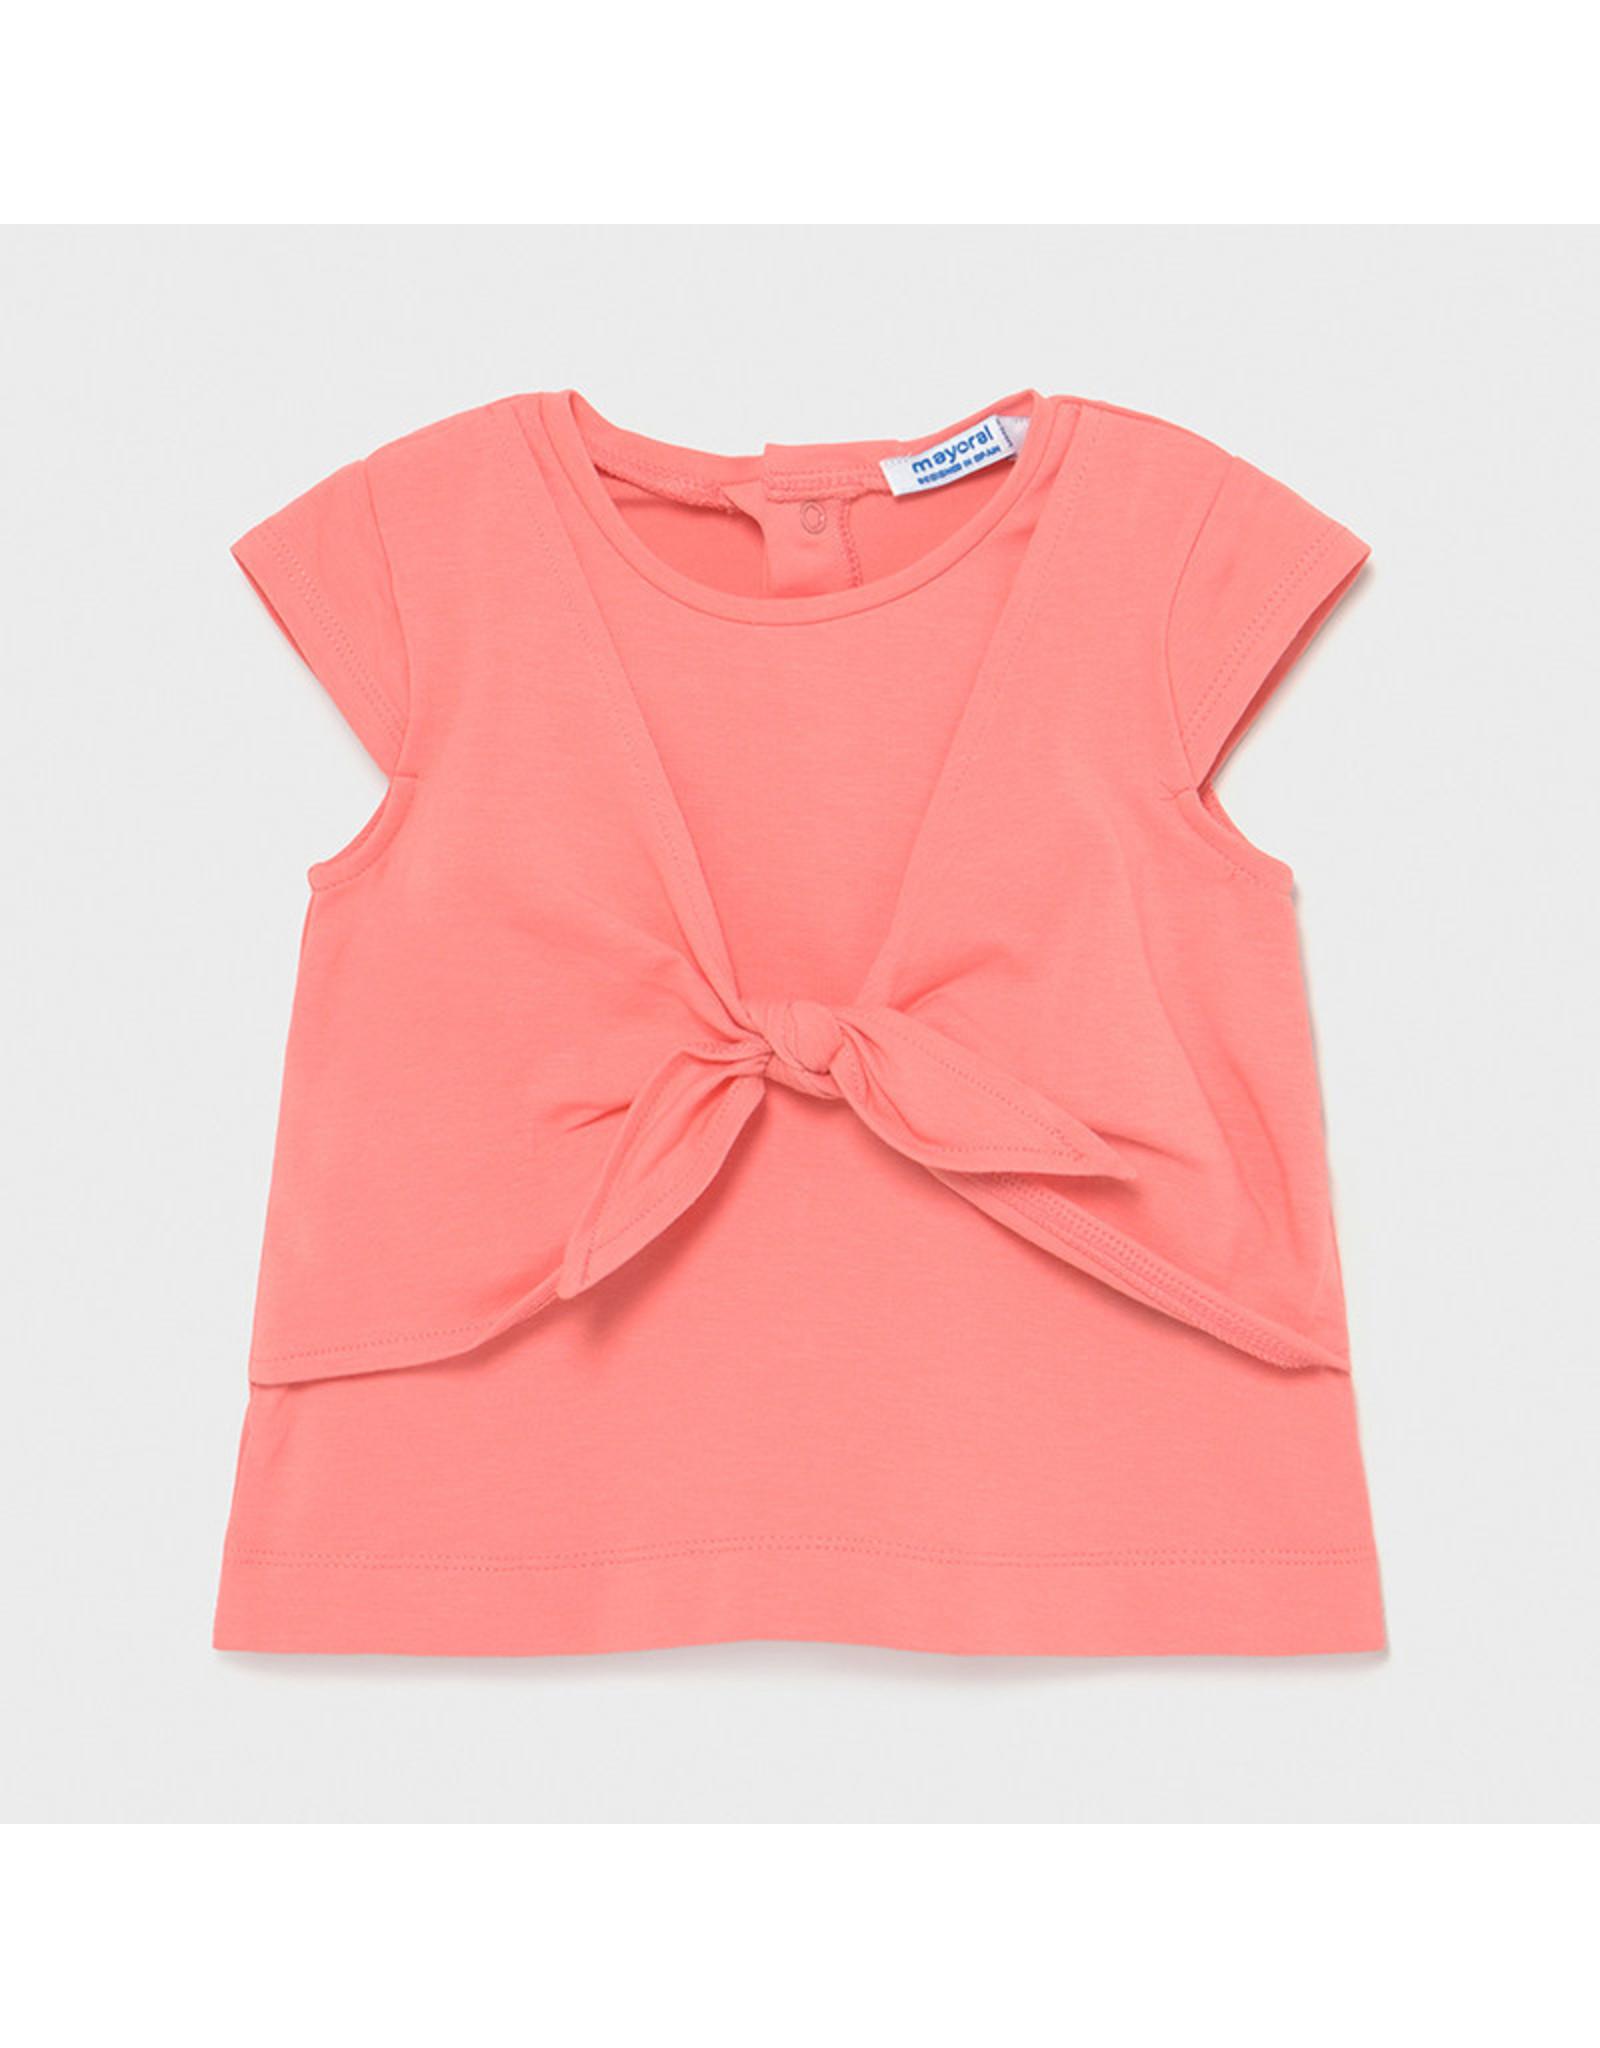 Mayoral Girls Short Sleeve T-Shirt